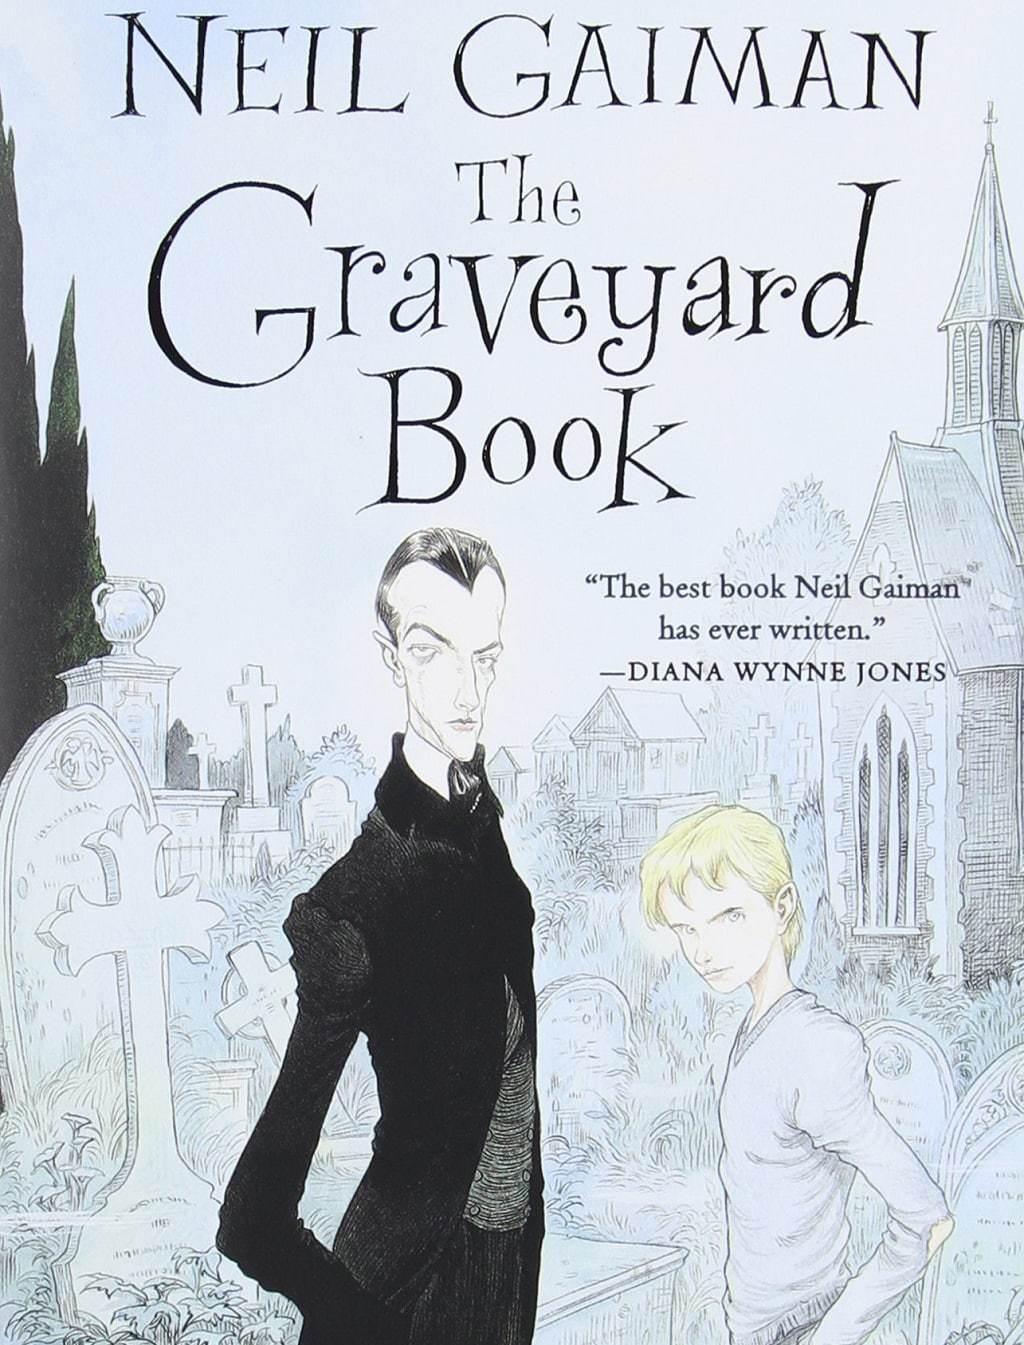 The Graveyard Book Audiobook Free Download